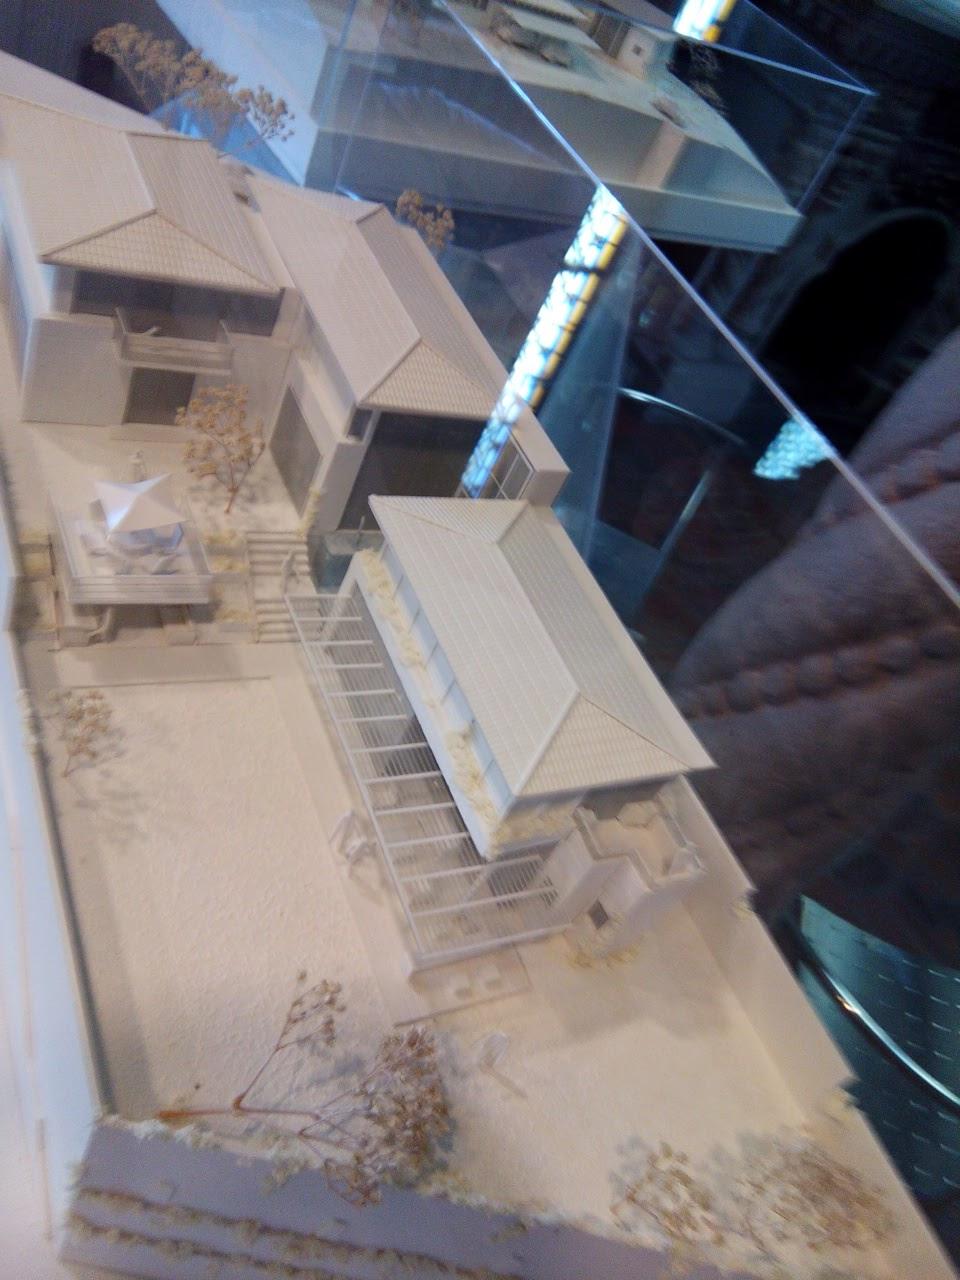 Maqueta de proyecto arquitectónico